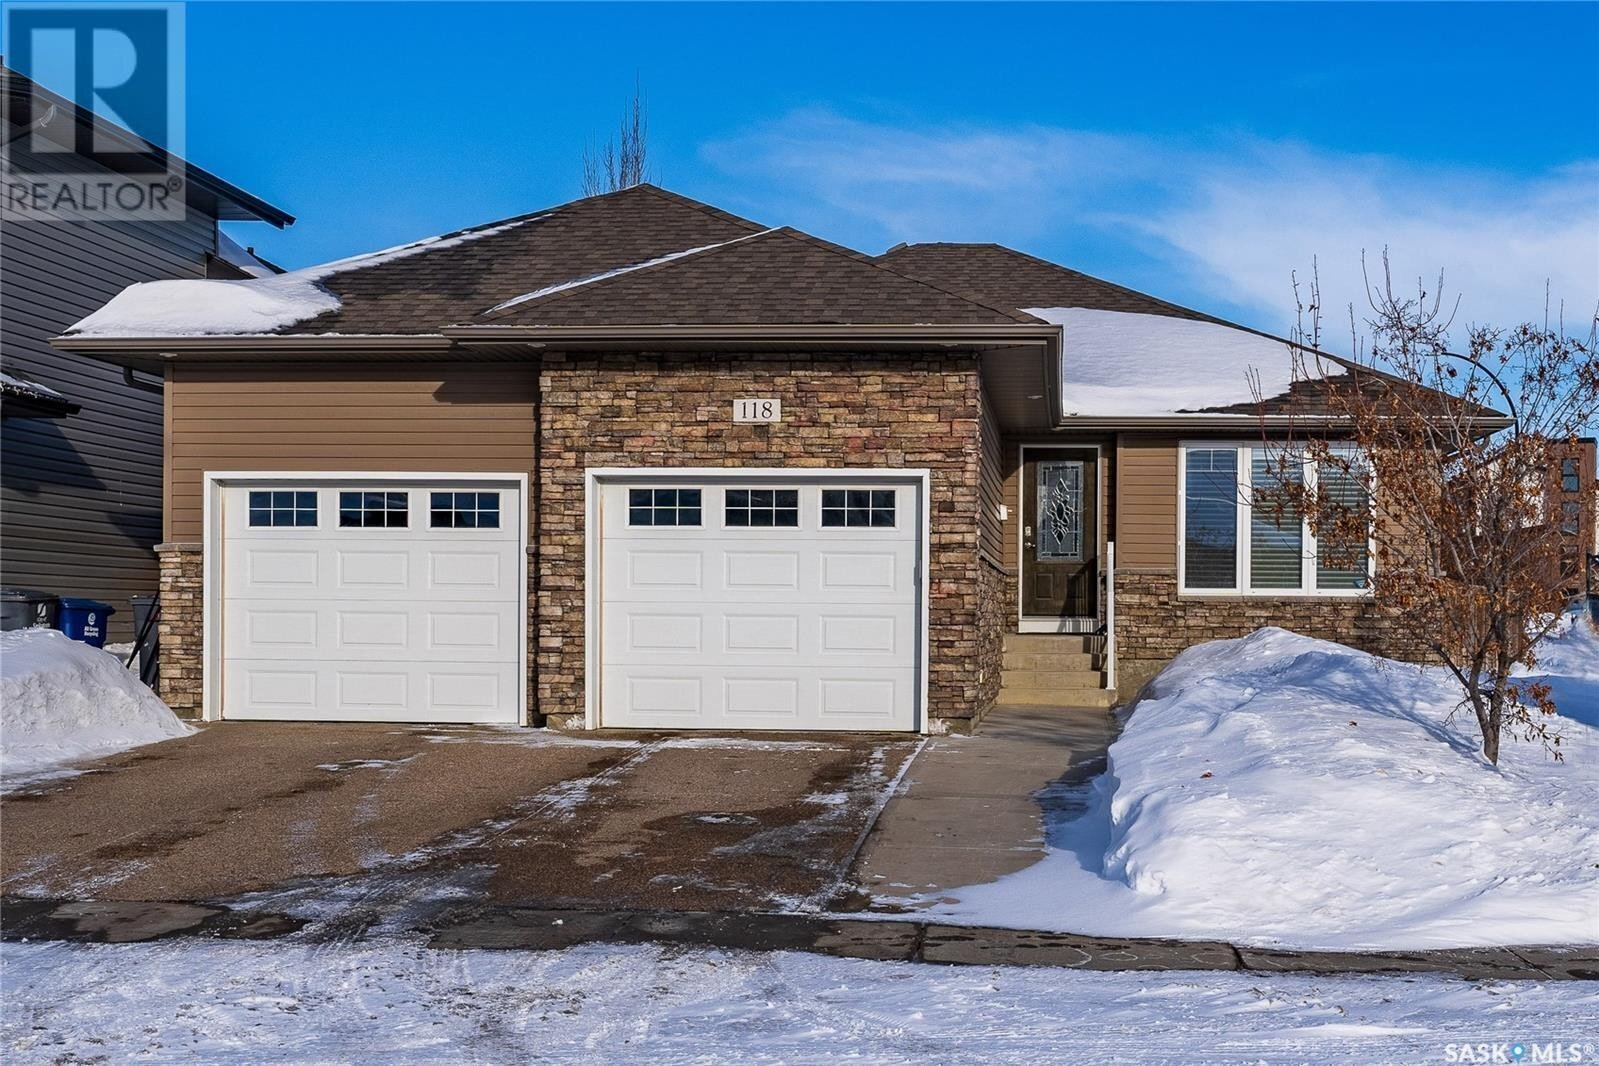 House for sale at 118 Stefaniuk Cres Saskatoon Saskatchewan - MLS: SK839264